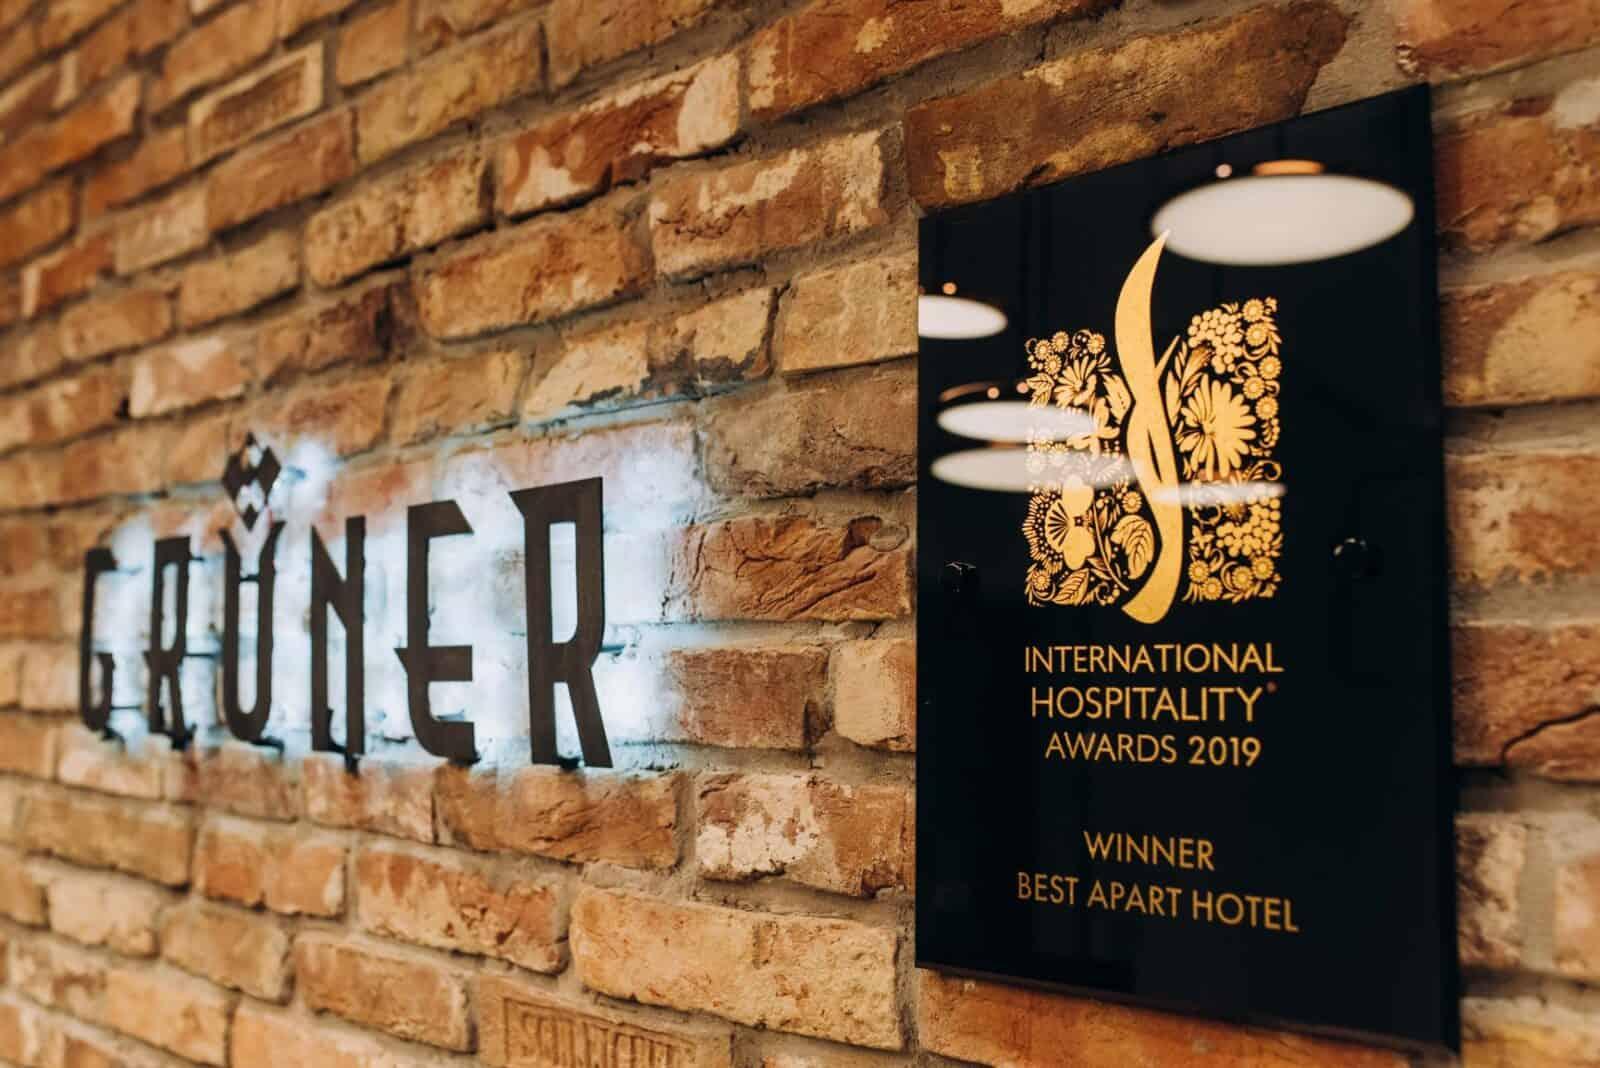 Gruner Hotel Award